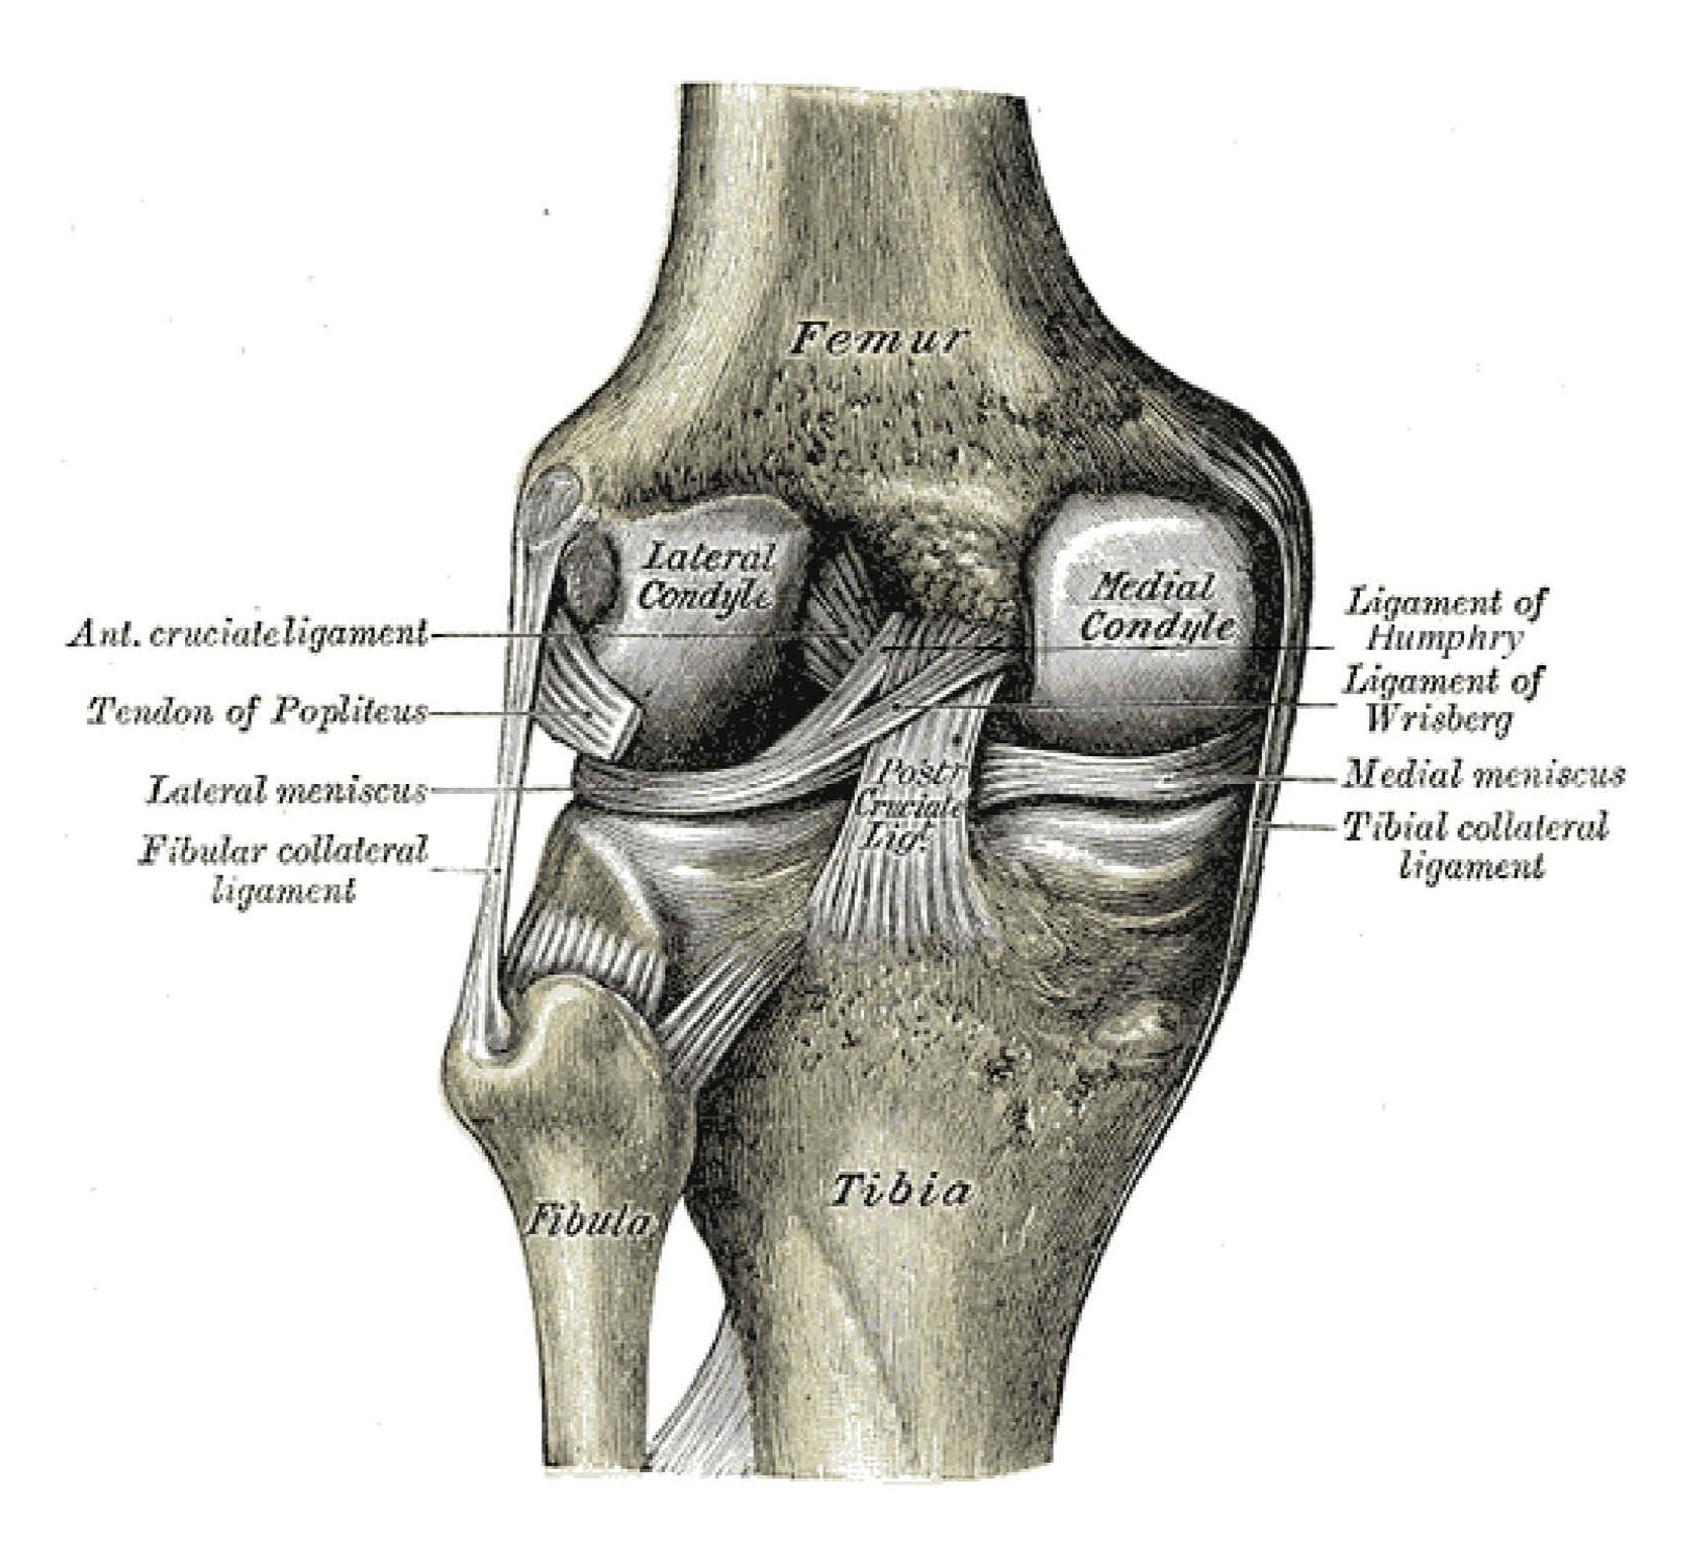 Posterior Cruciate Ligament Injury